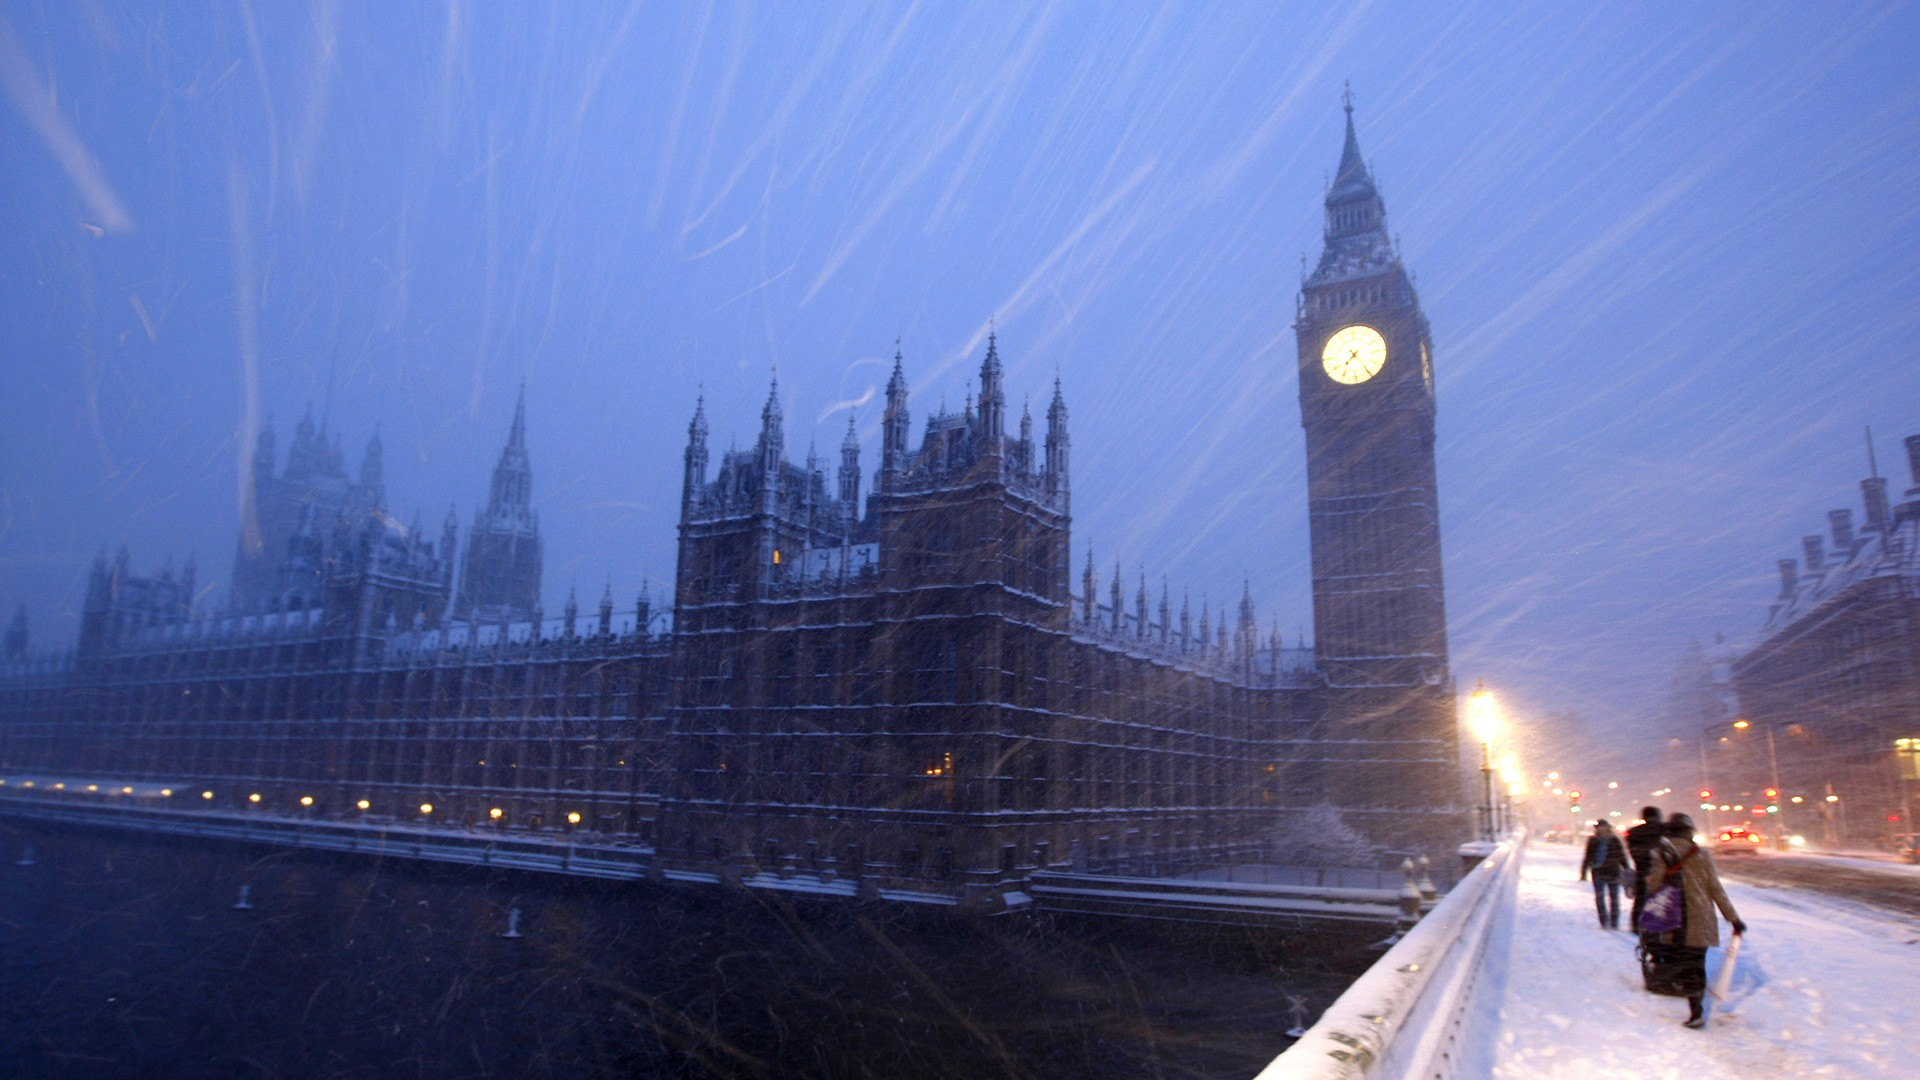 london snow wallpaper 2015 - Grasscloth Wallpaper